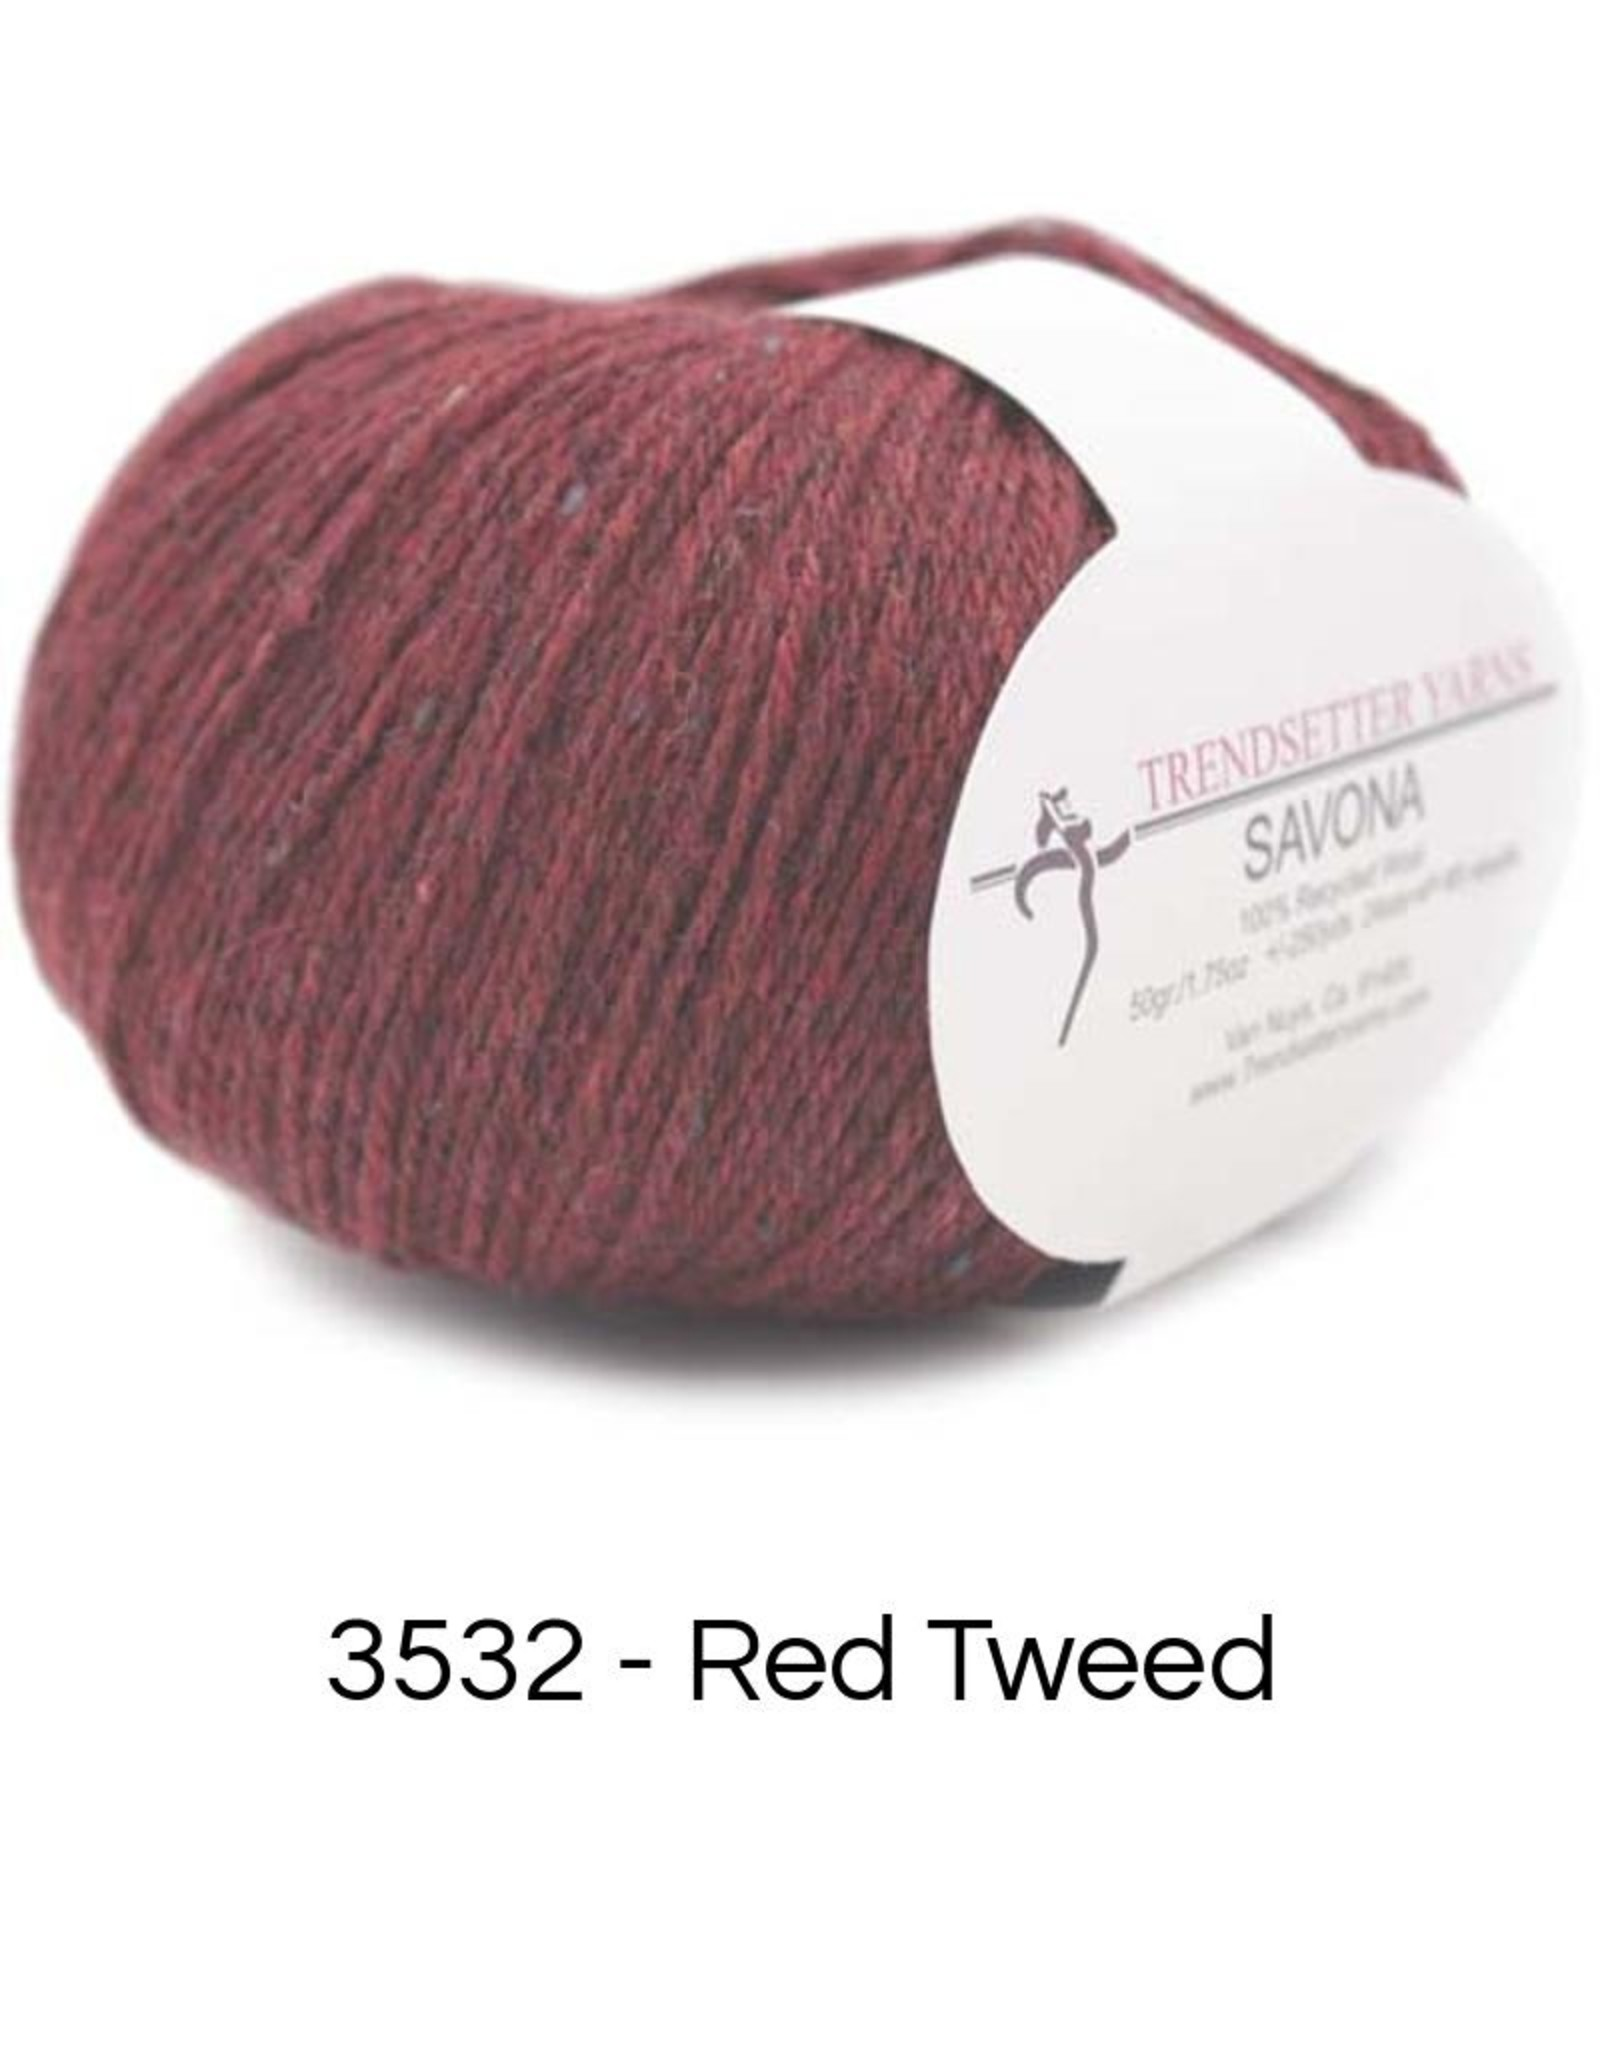 Trendsetter Yarn Group Savona